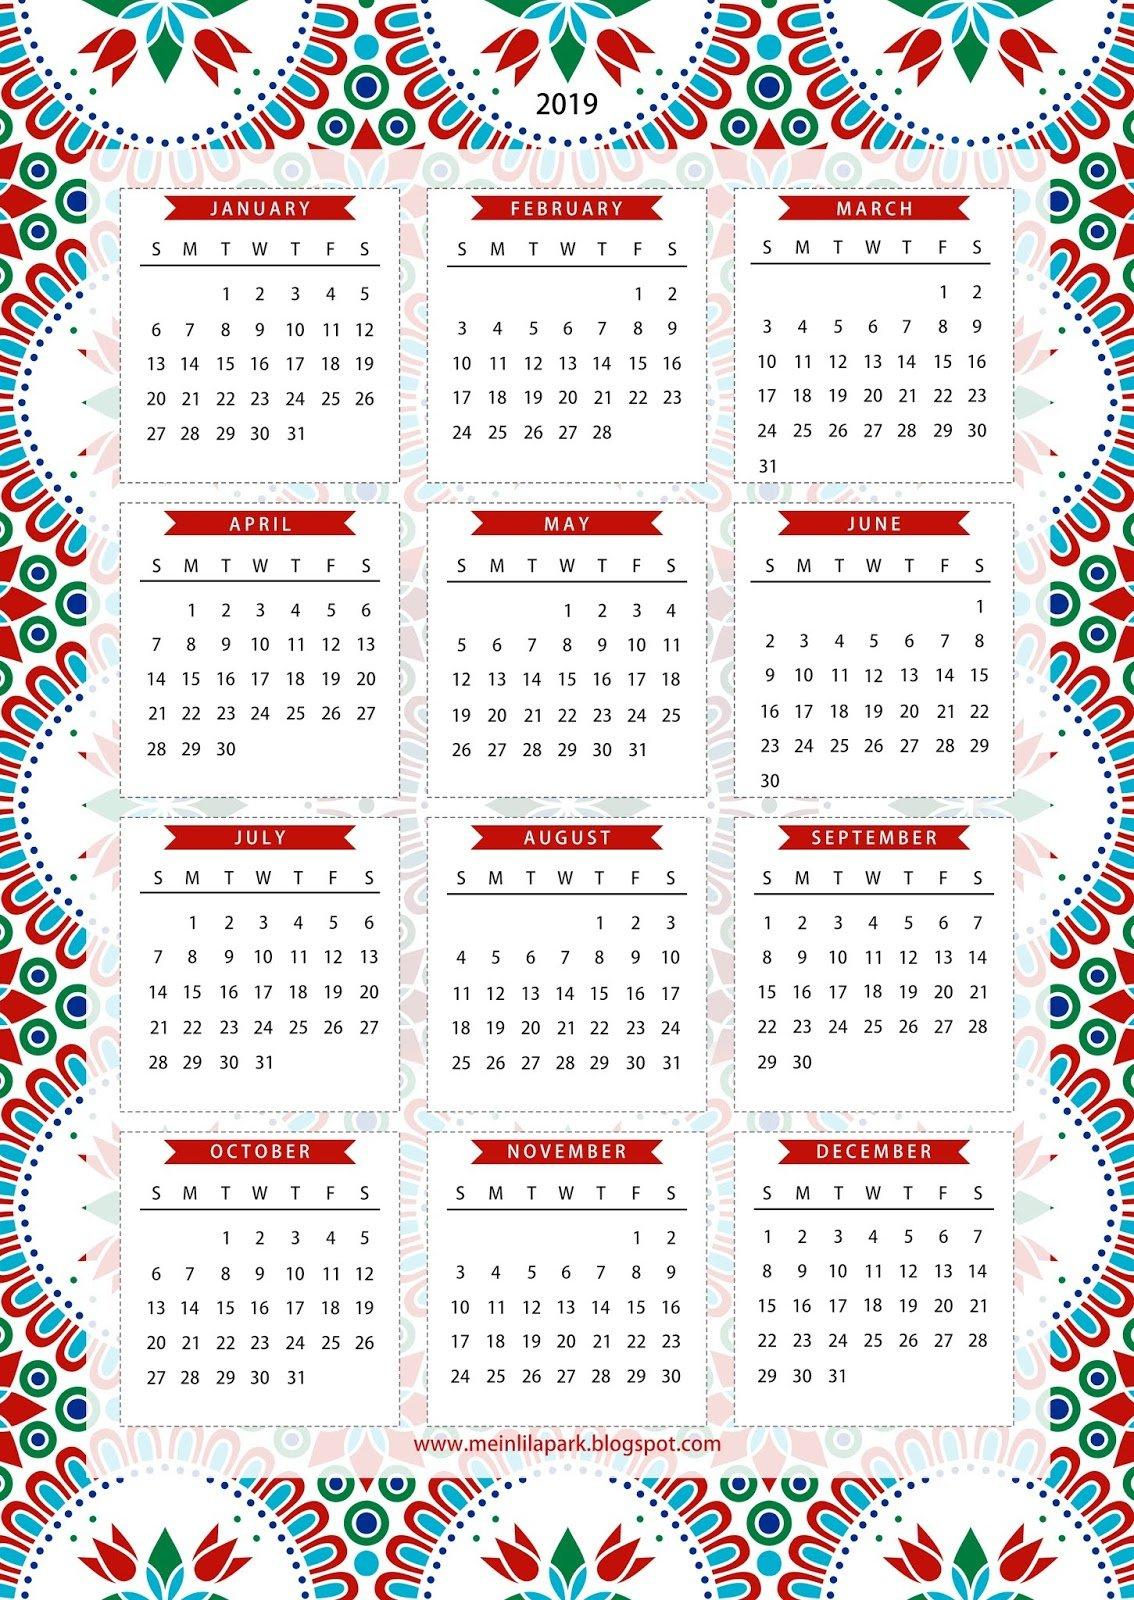 Free Printable 2019 One Page Calendar - Kalender - Freebie Small Free Printable Calendar